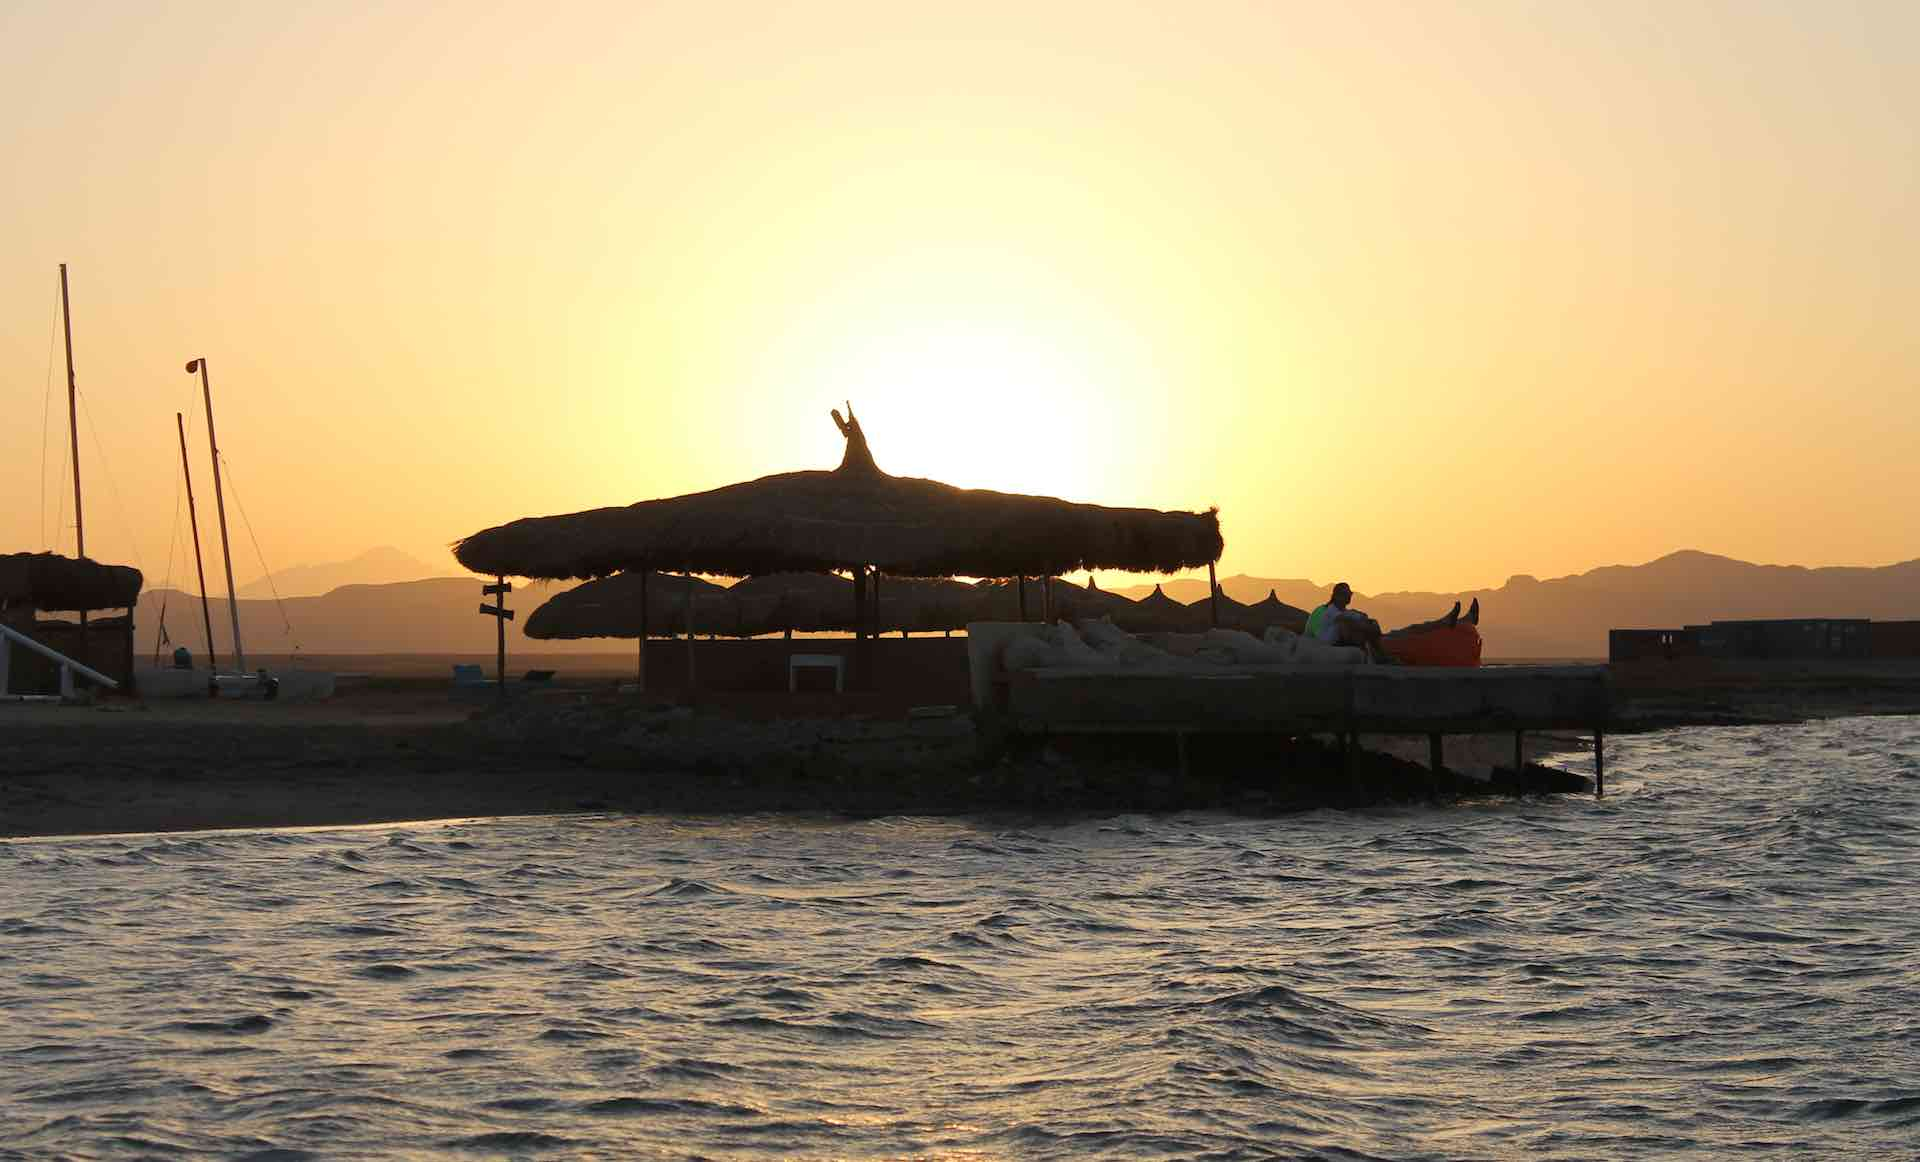 Kitesurfing spot beach sunset, El Gouna Egypt